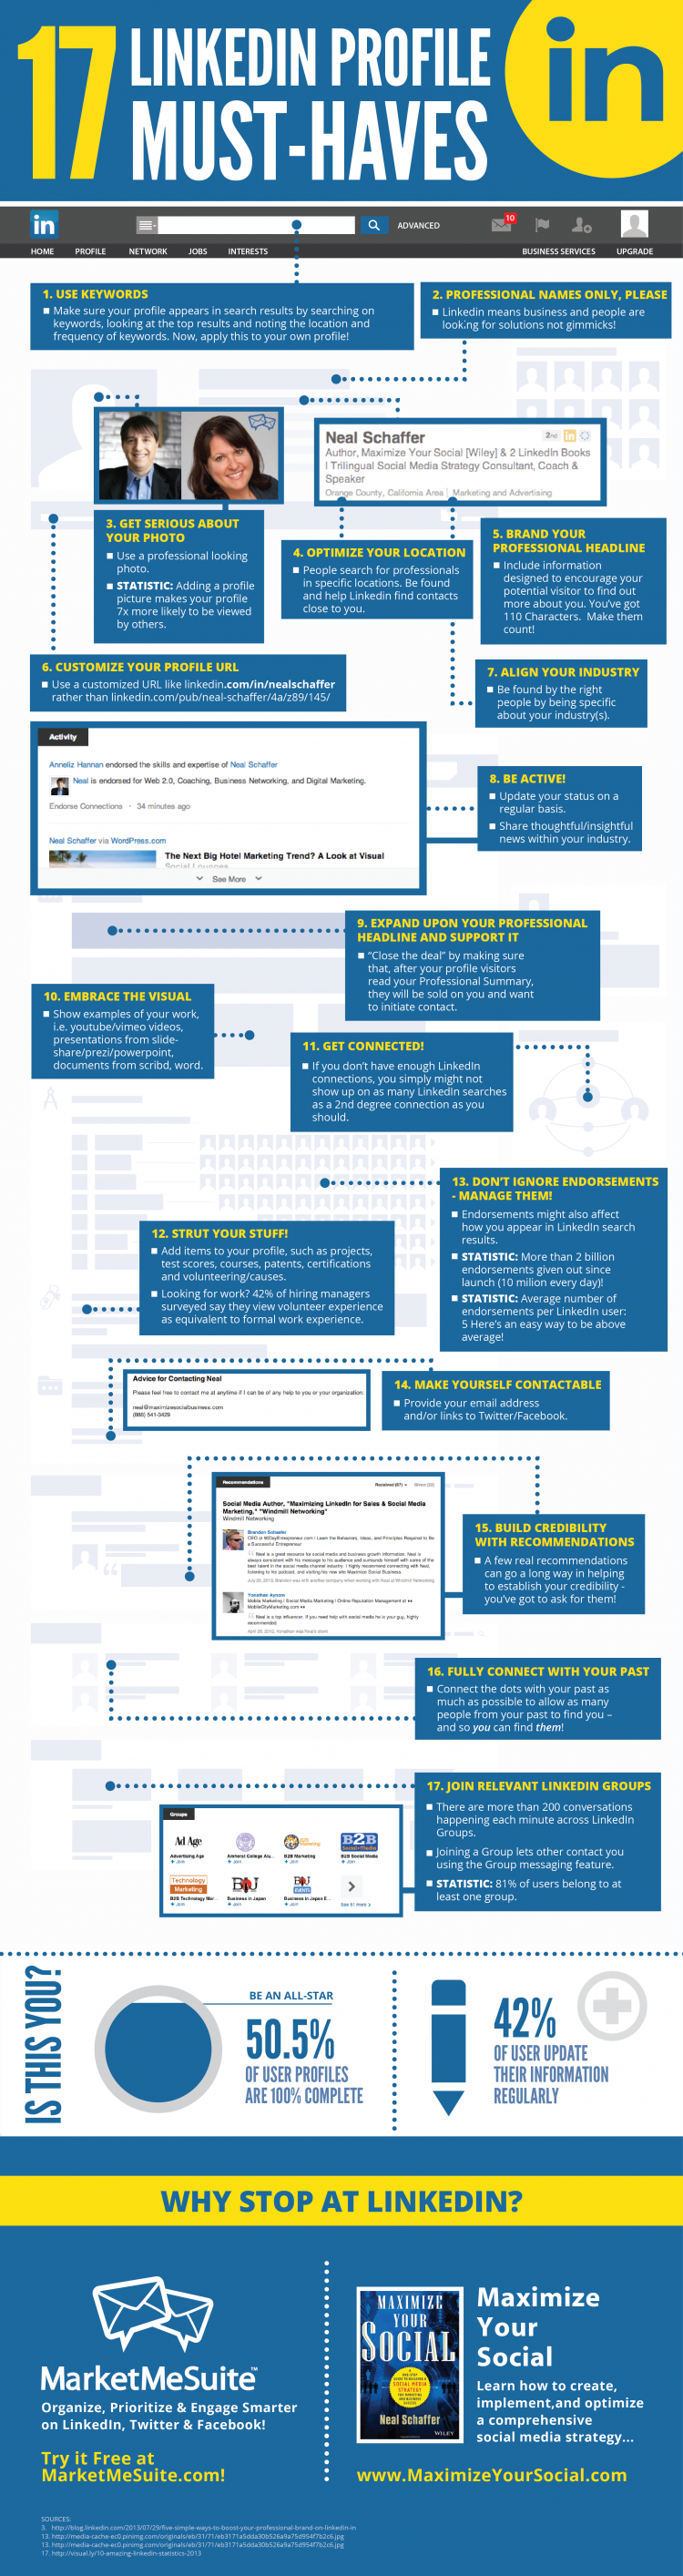 Linkedin Profile Must Haves Social Media Linkedin Tips Social Media Infographic